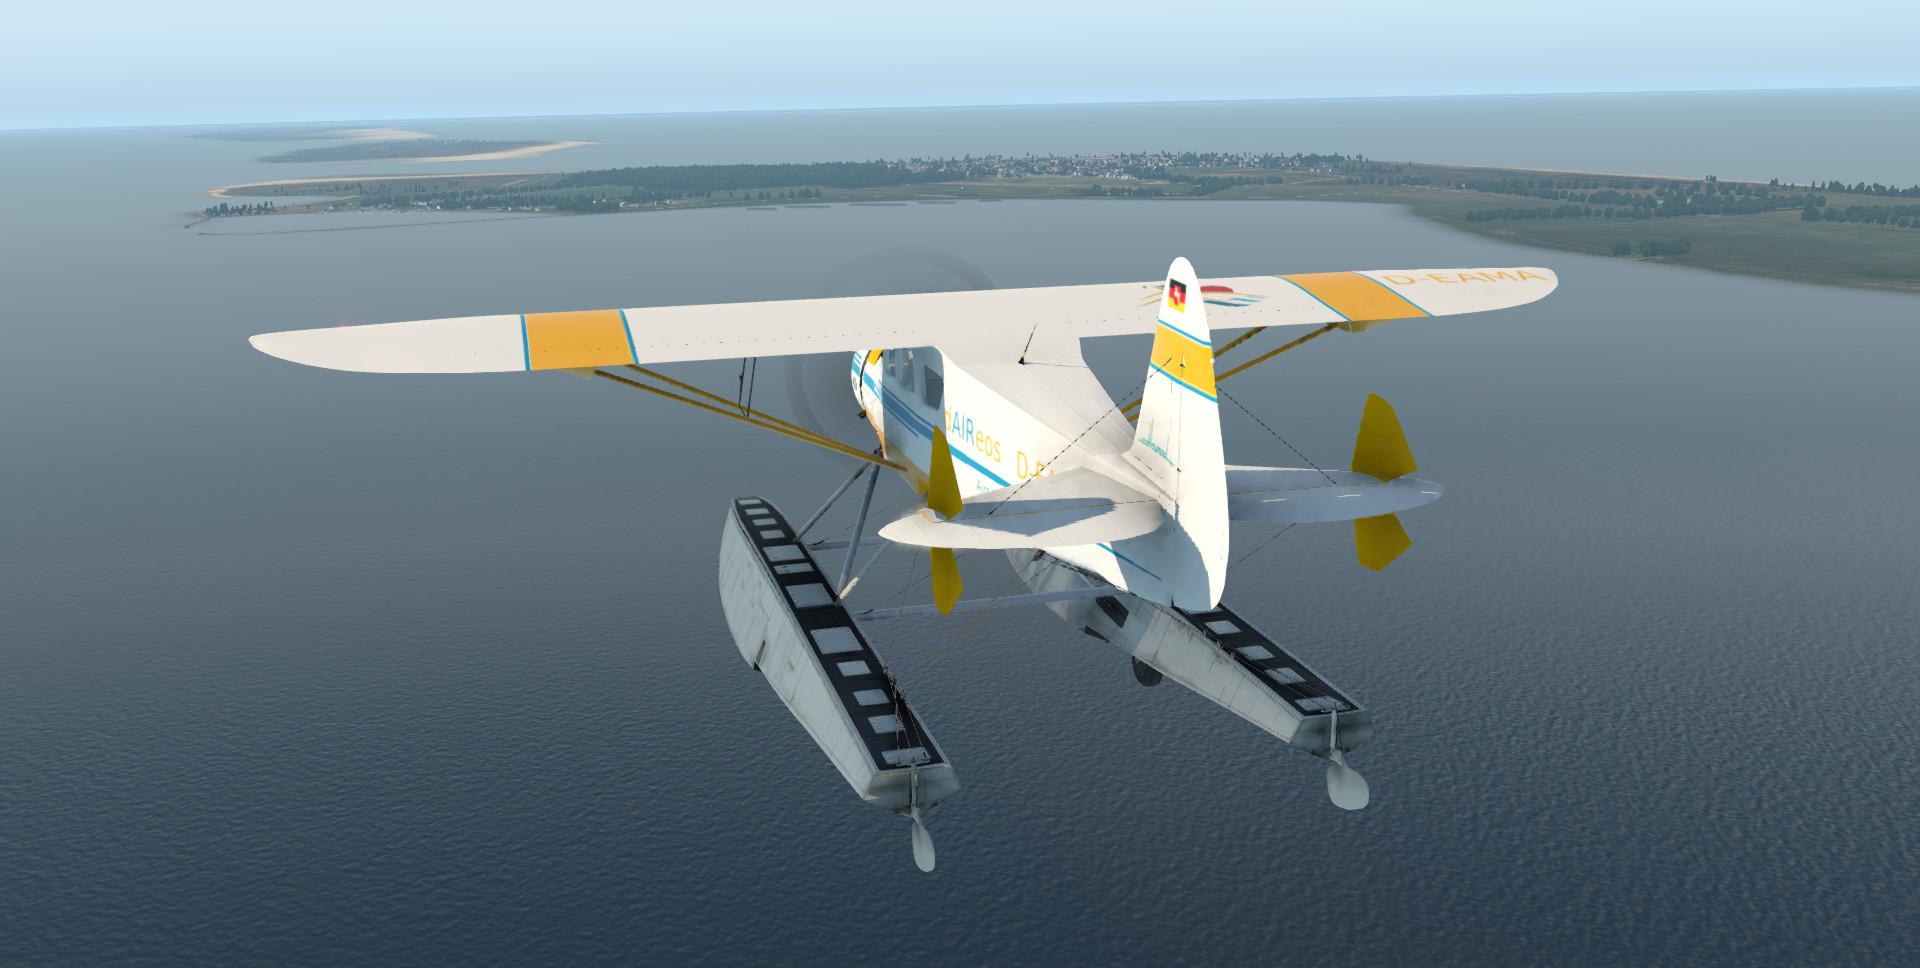 nordseerundflug-0084tjai.jpg